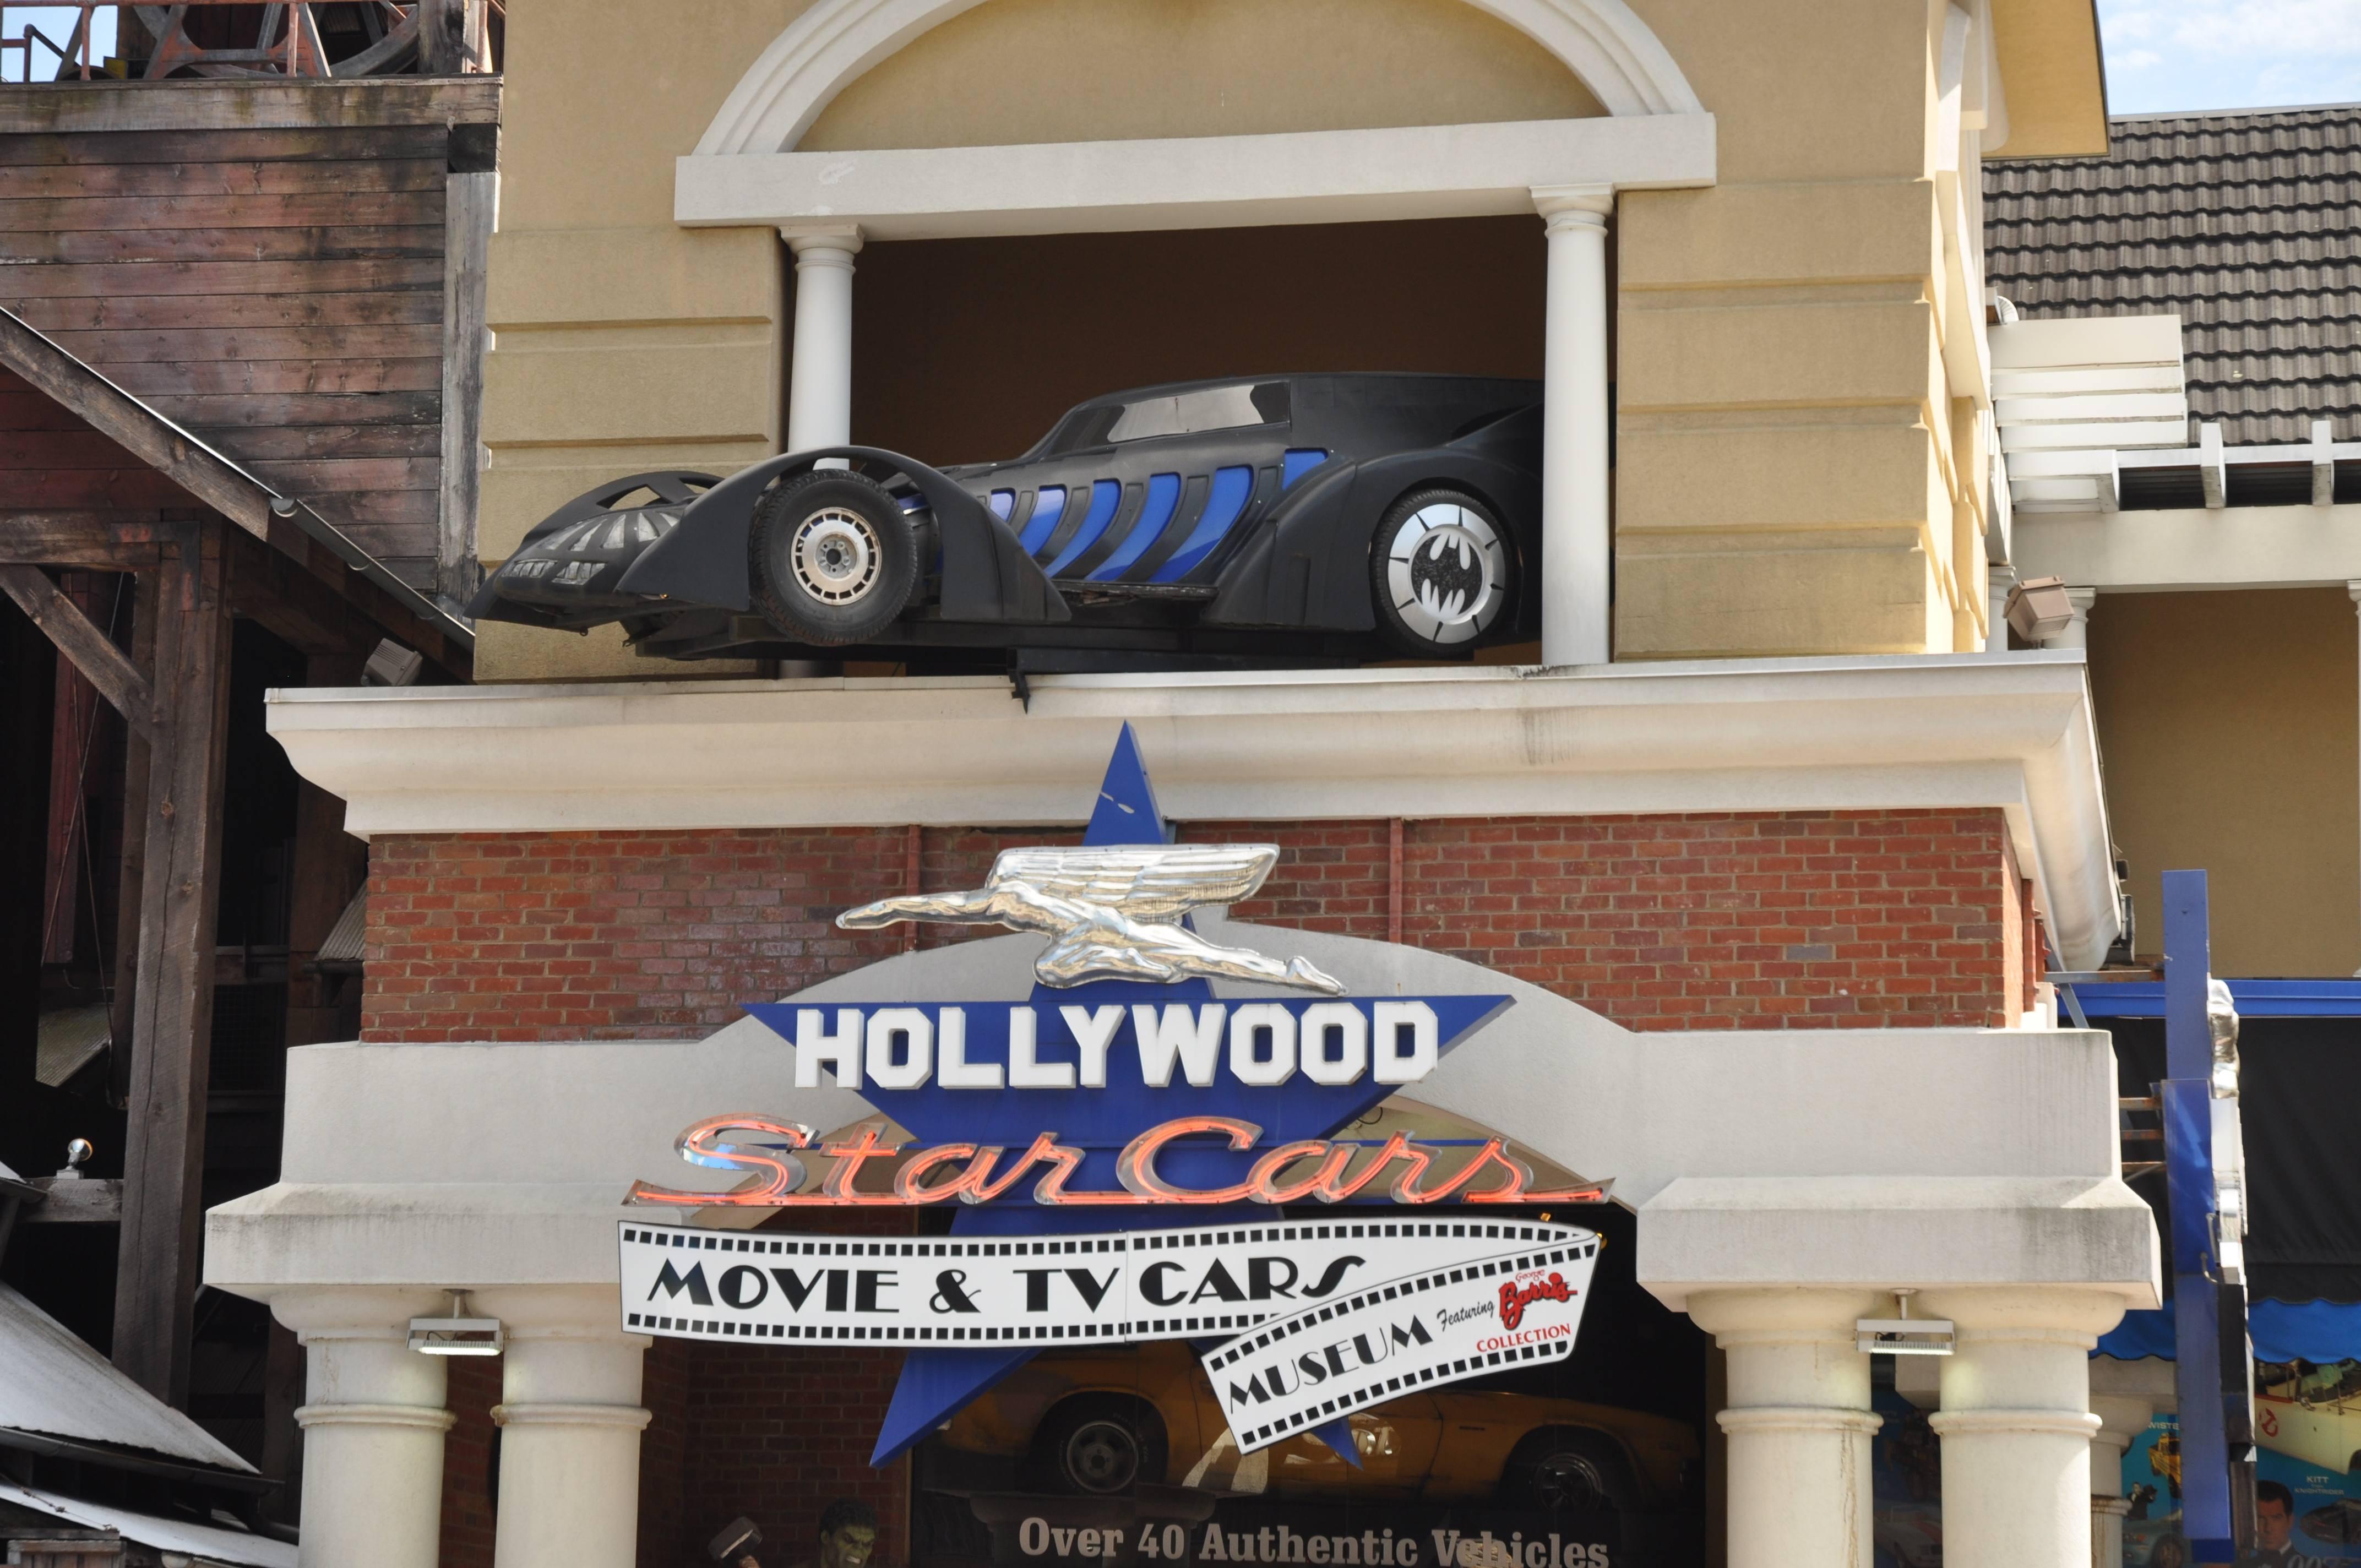 Hollywood Star Cars Museum in Gatlinburg